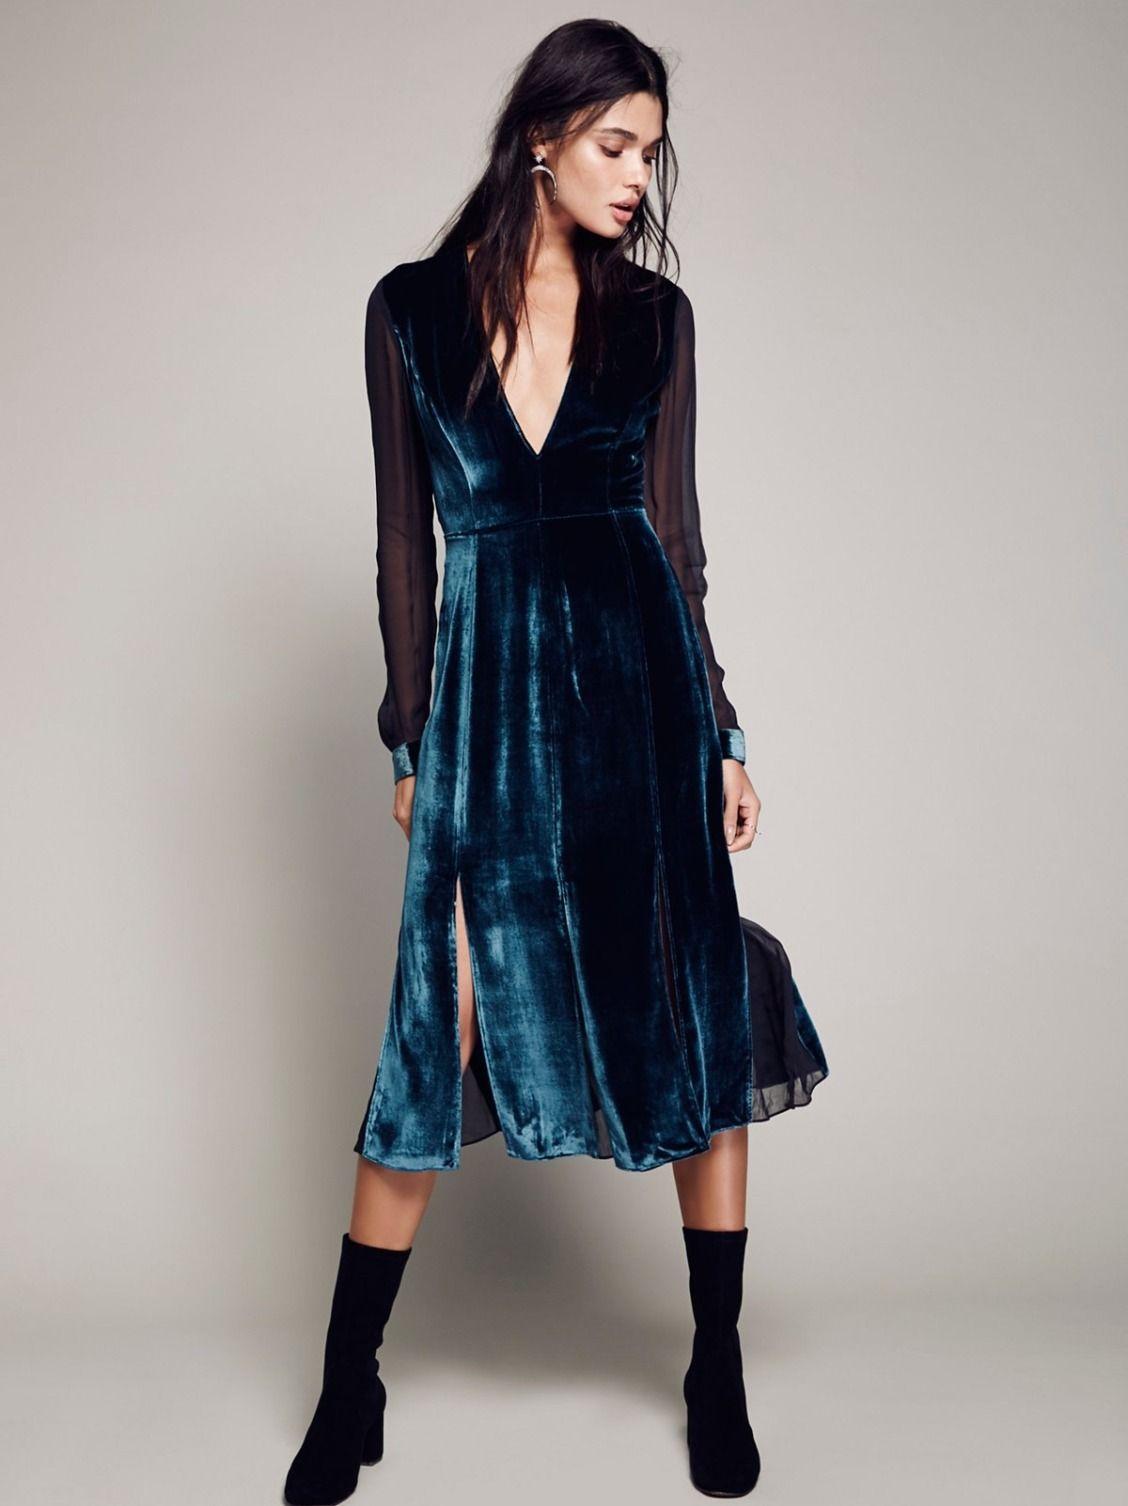 Retro Style Transparent Chiffon Patchwork Midi Dresses 2017 Autumn Long  Sleeve Dresses Sexy V neck Velvet 6201de5db